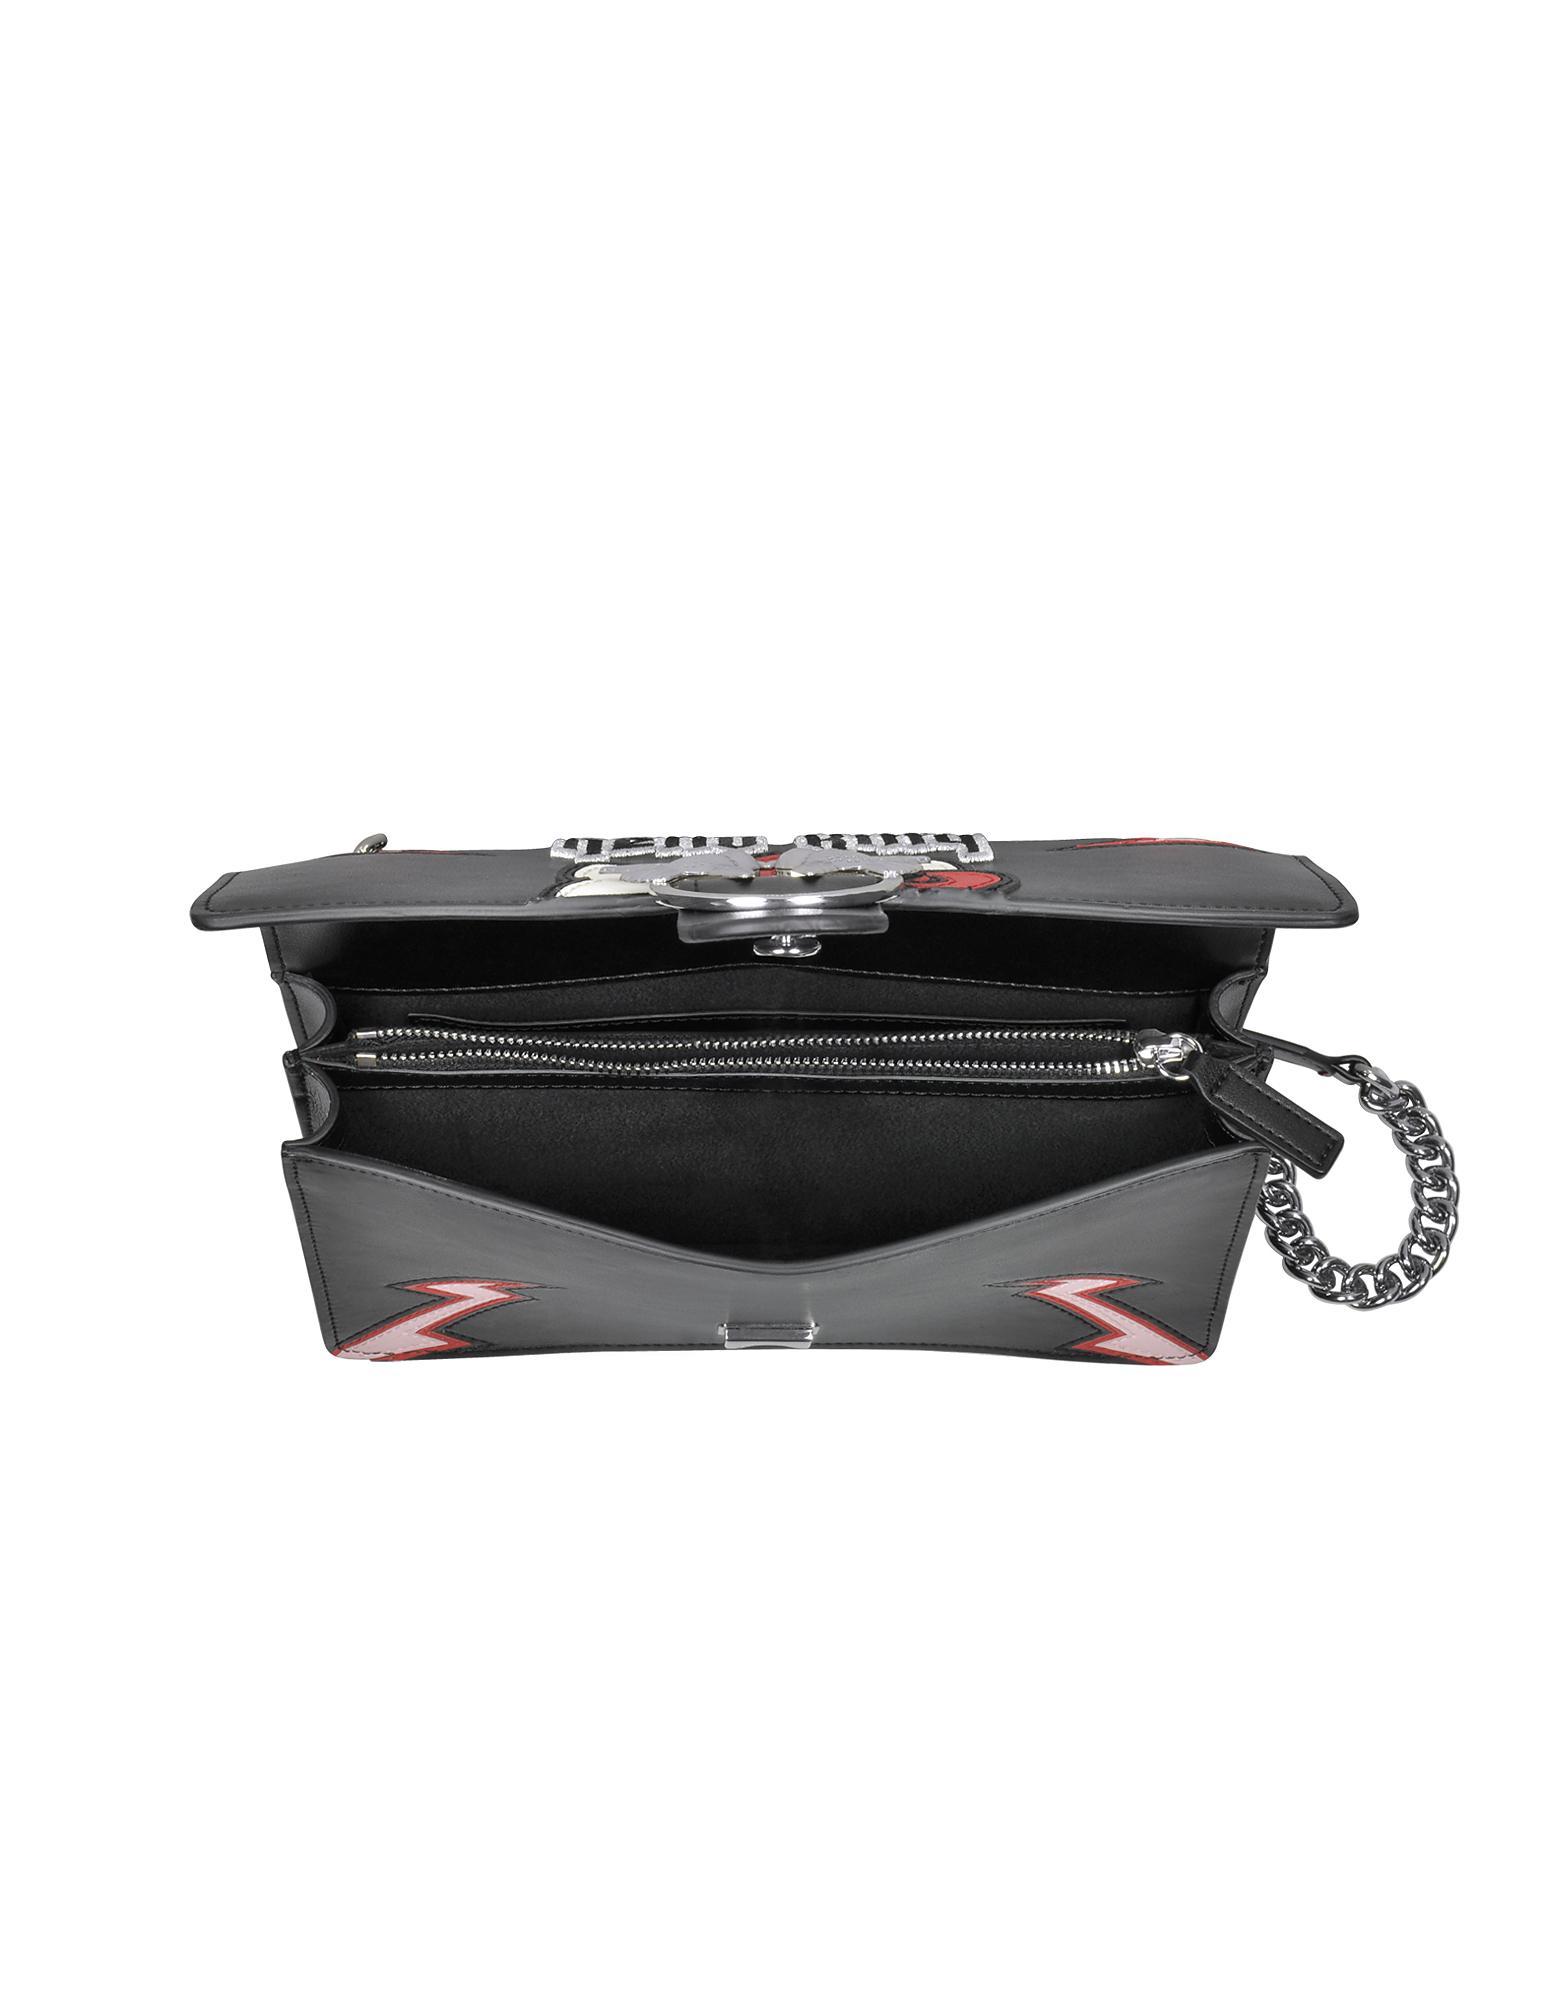 6d33417c92f3 Lyst - Pinko Women s Black Faux Leather Shoulder Bag in Black